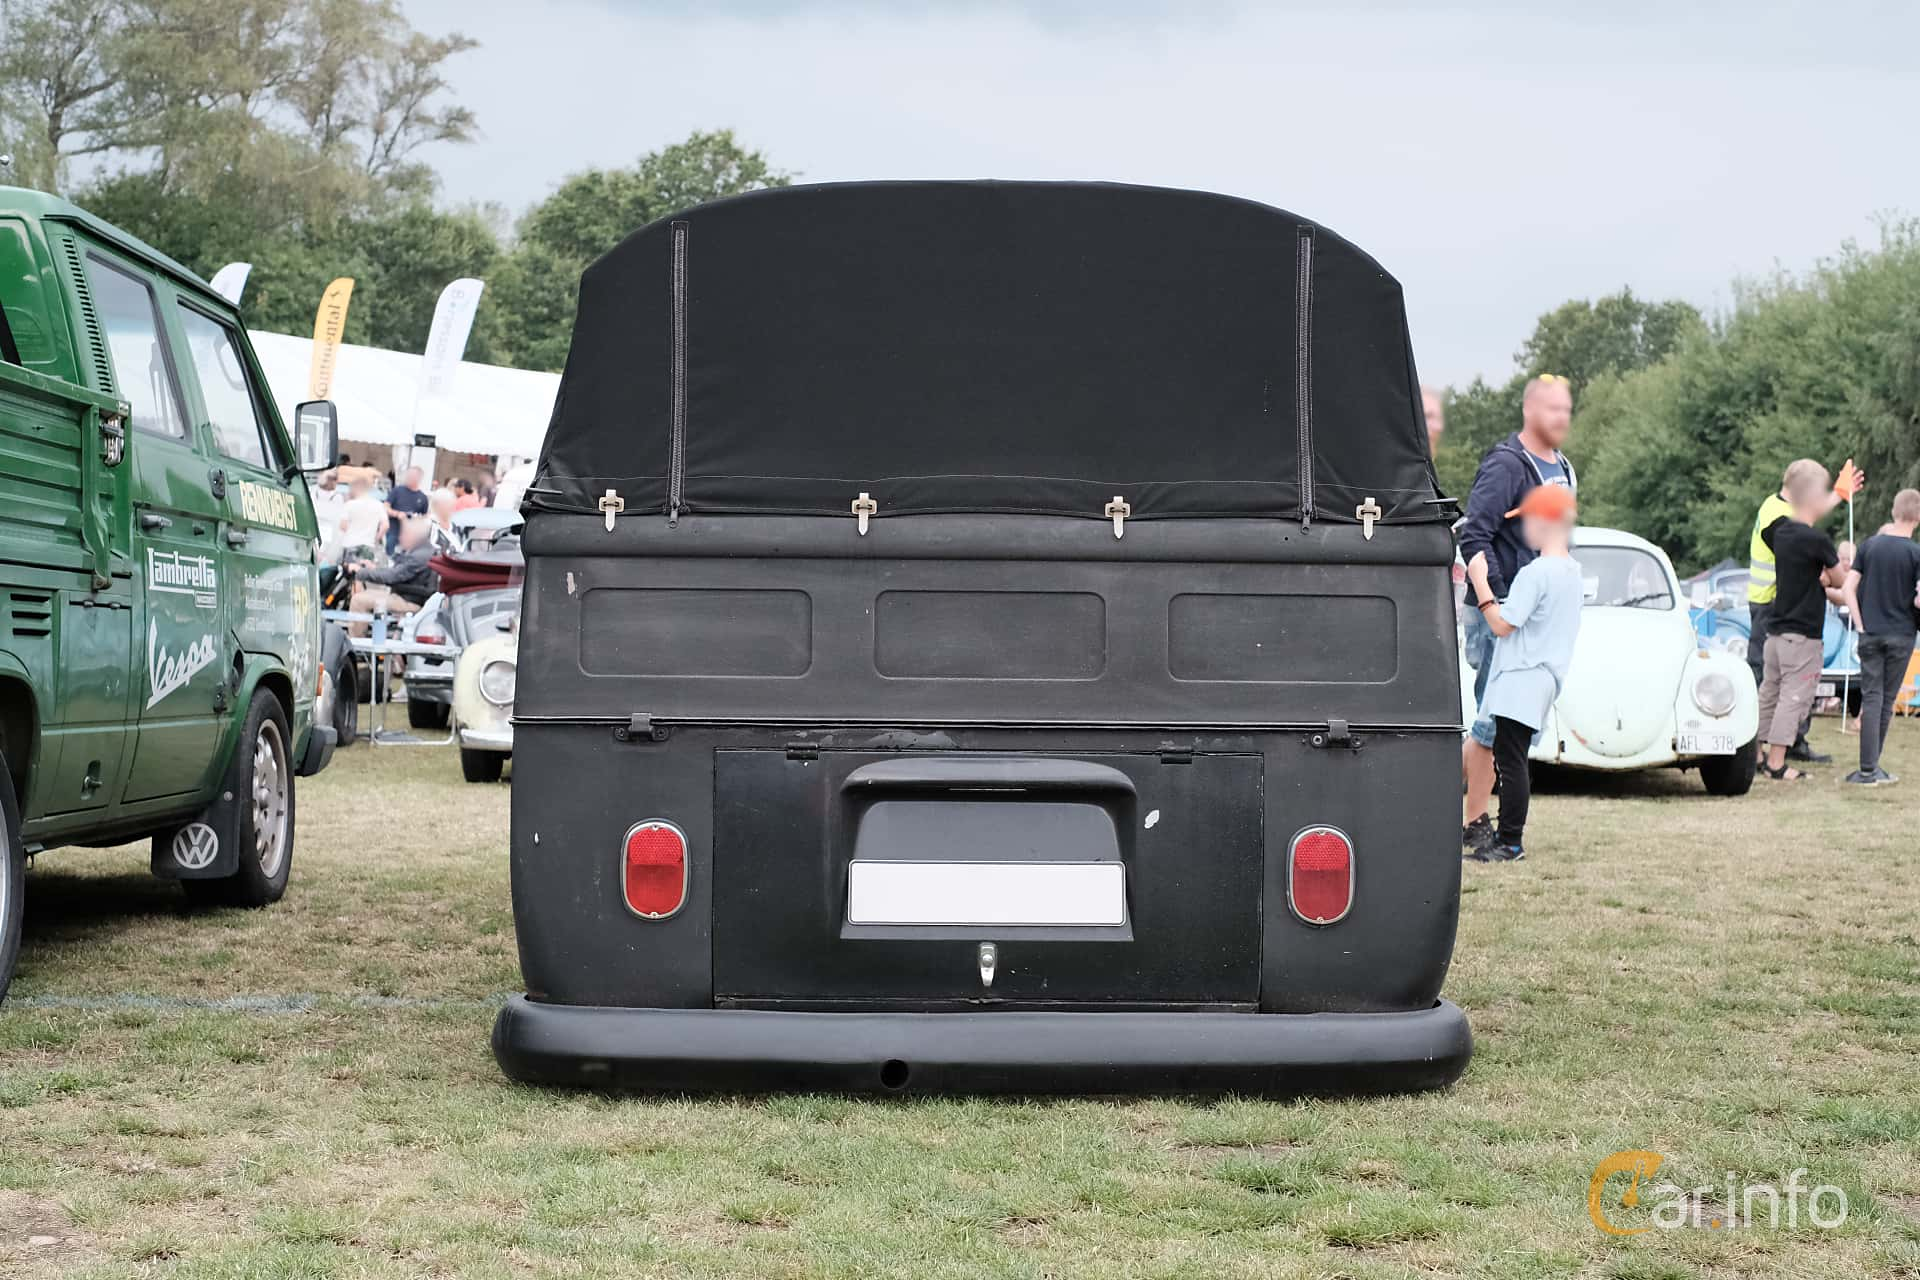 Volkswagen Transporter 1500 Pickup 1.5 Manual, 44hp, 1966 at West Coast Bug Meet 2019